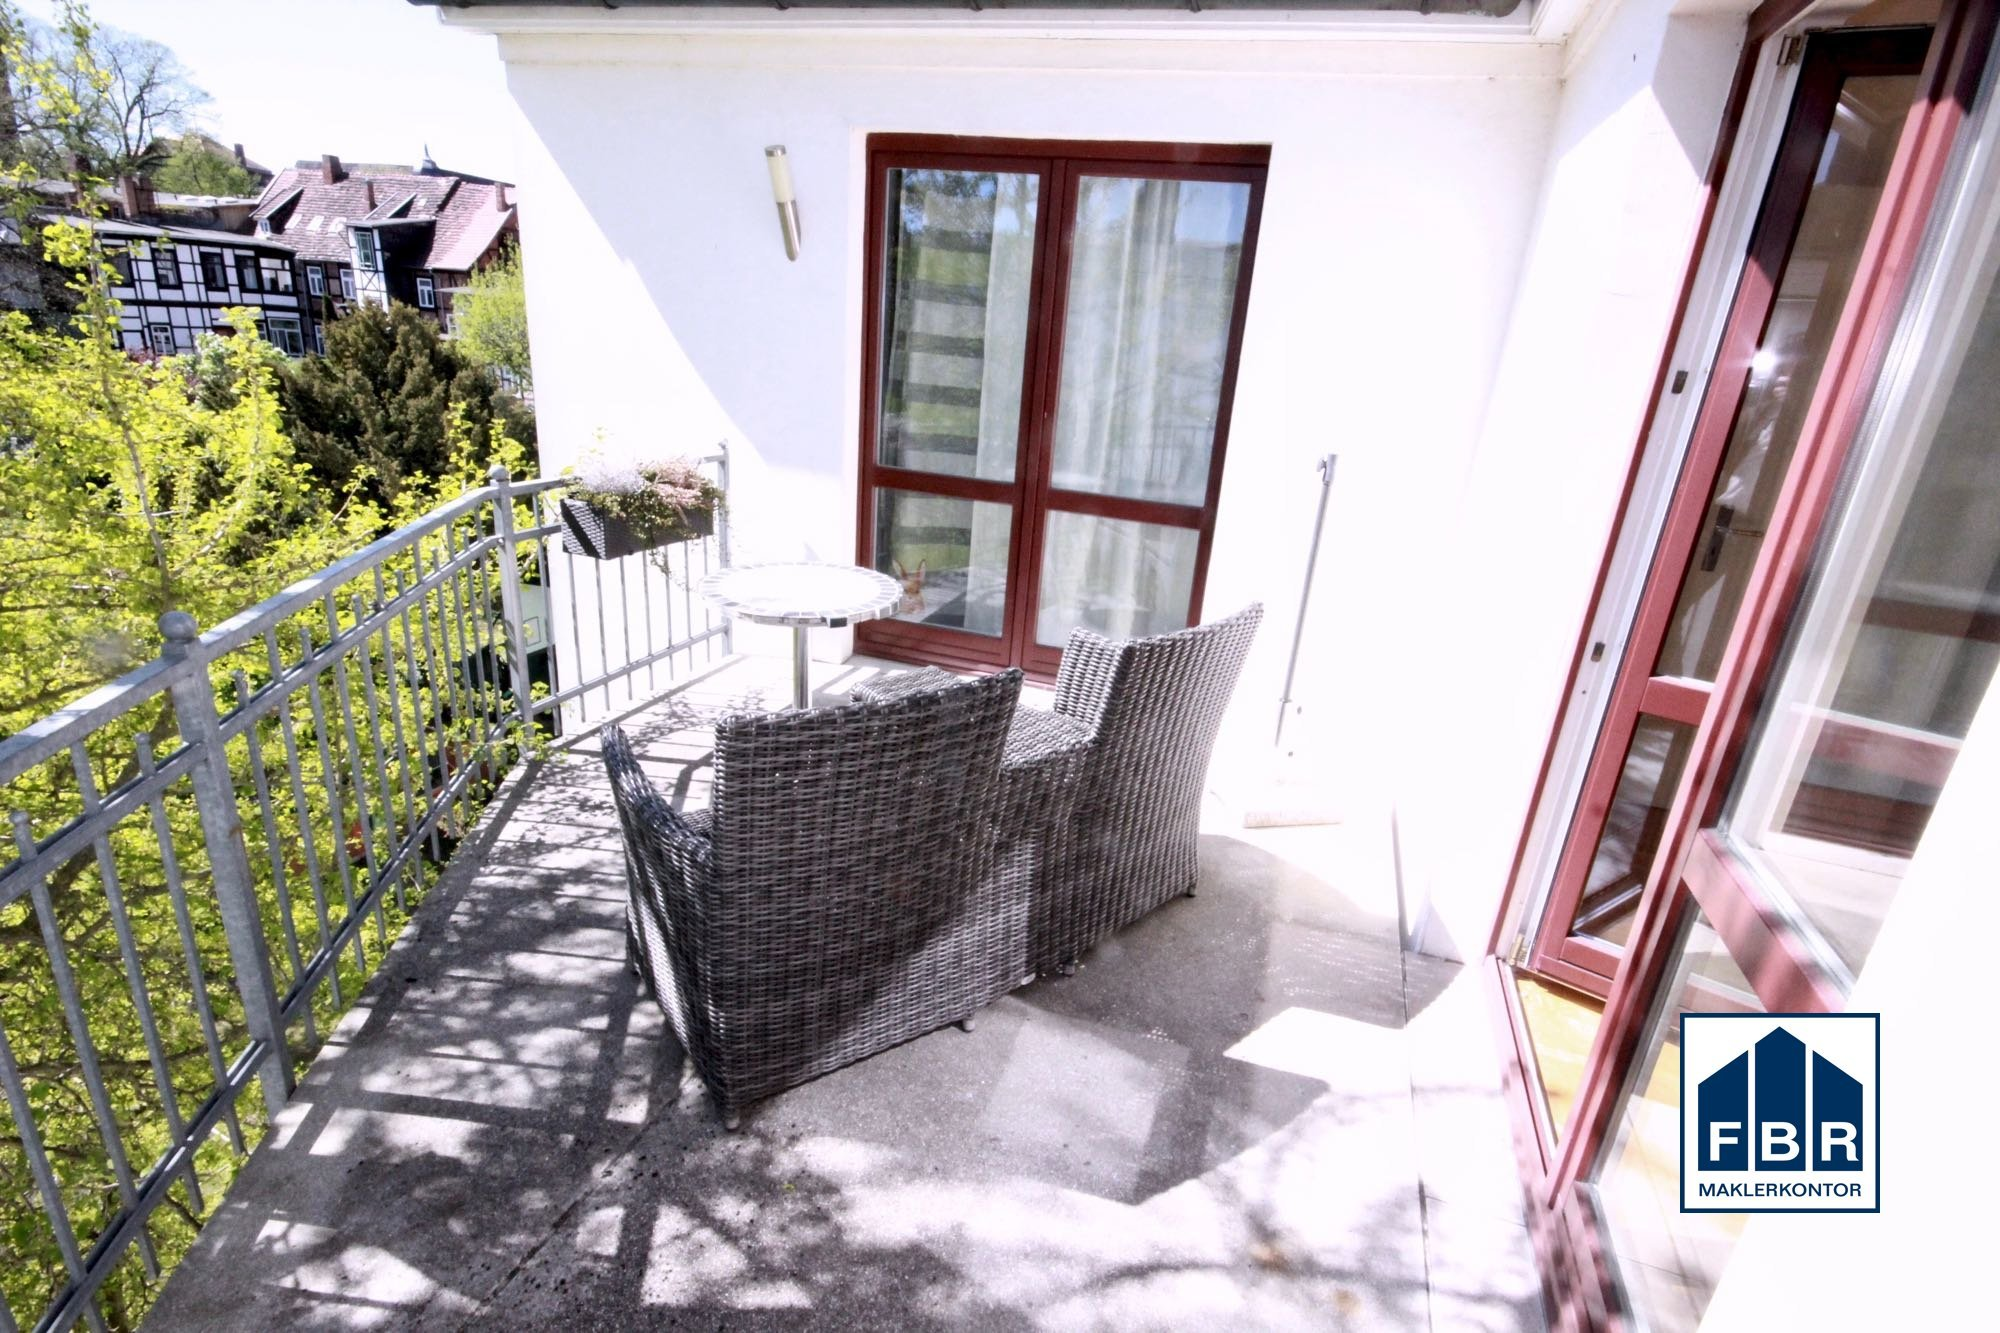 gemeinsamer Balkon